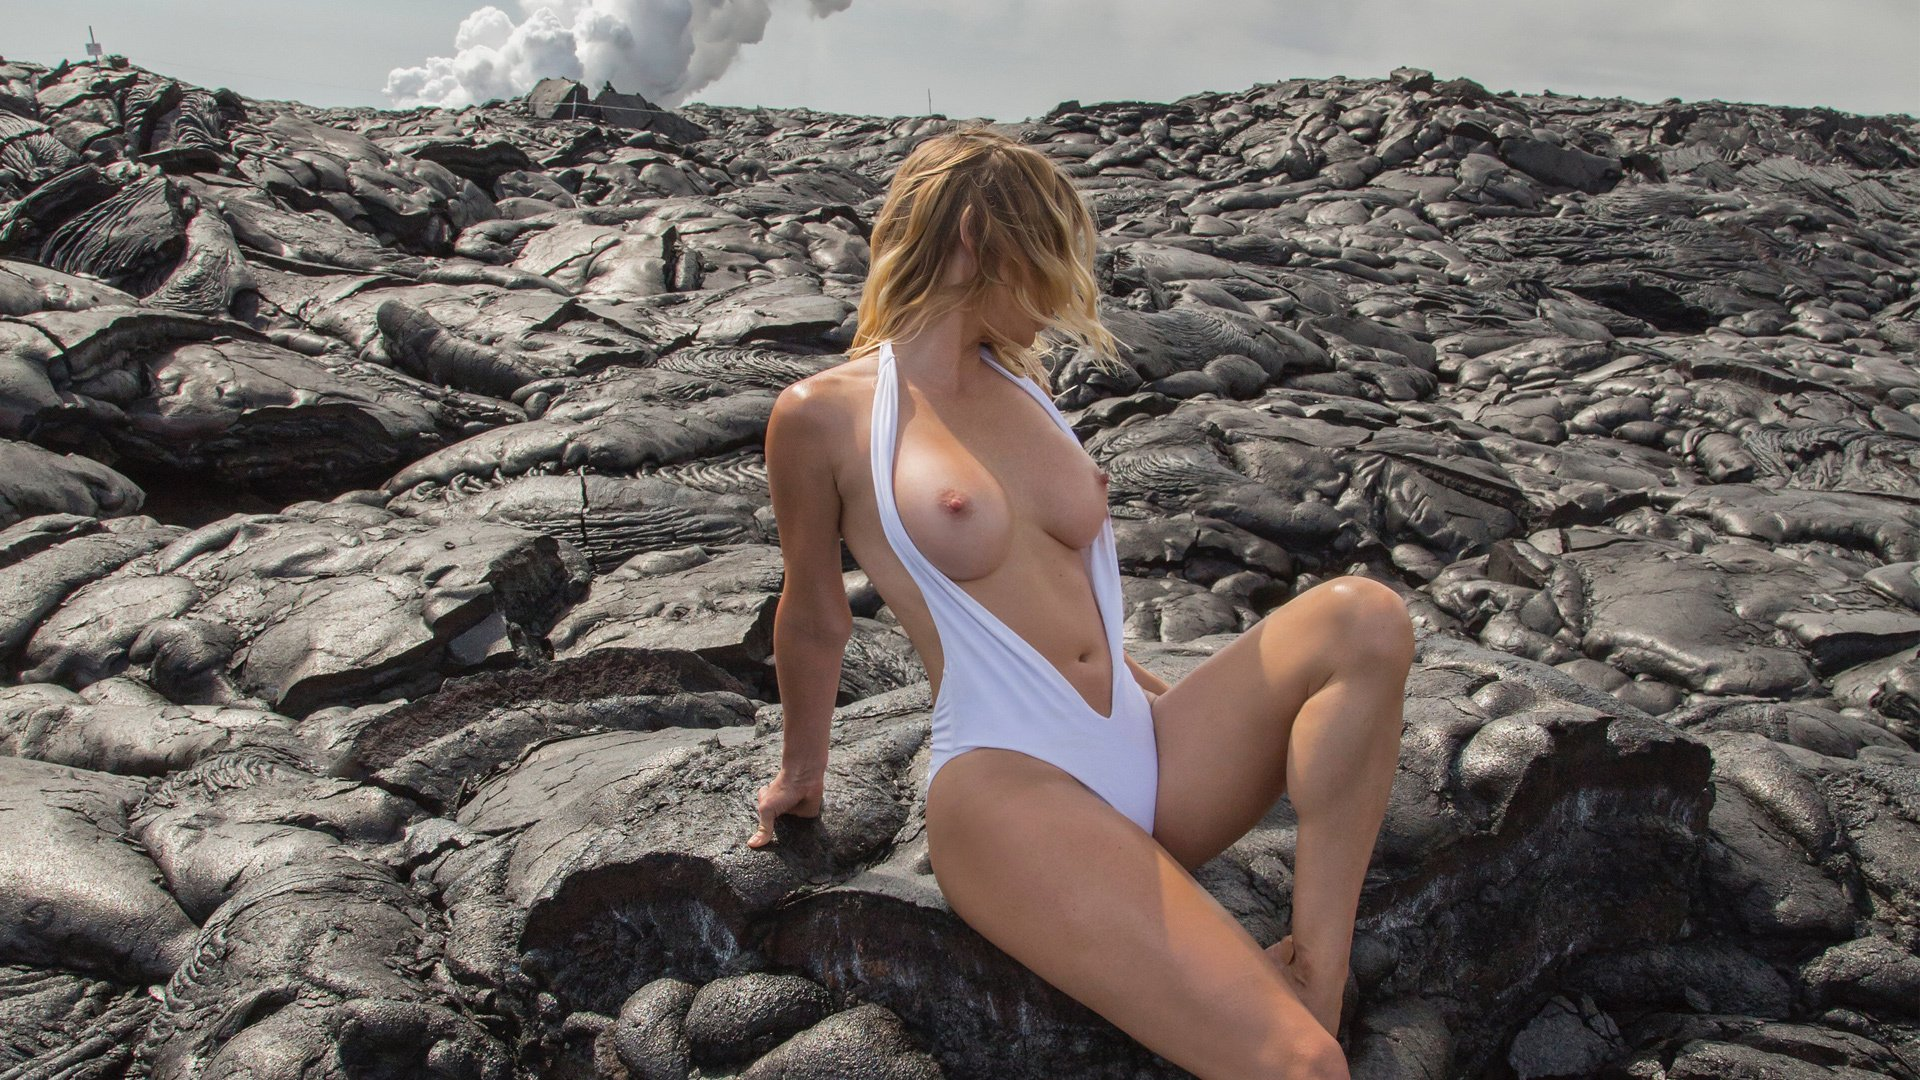 Sara underwood topless